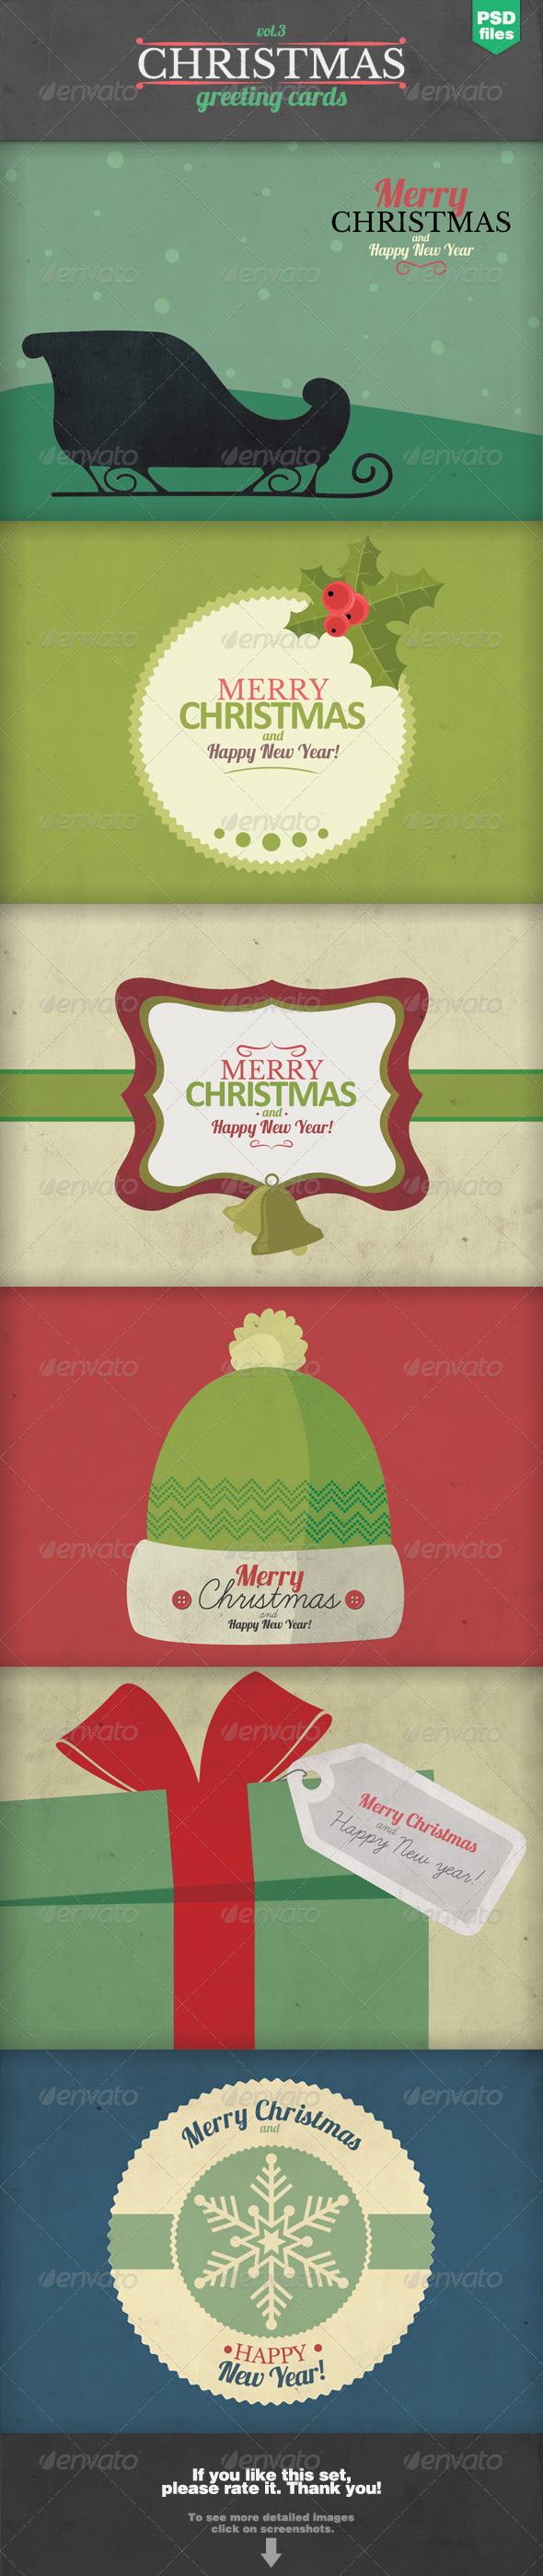 GraphicRiver Christmas Greeting Cards Set 3 6072153